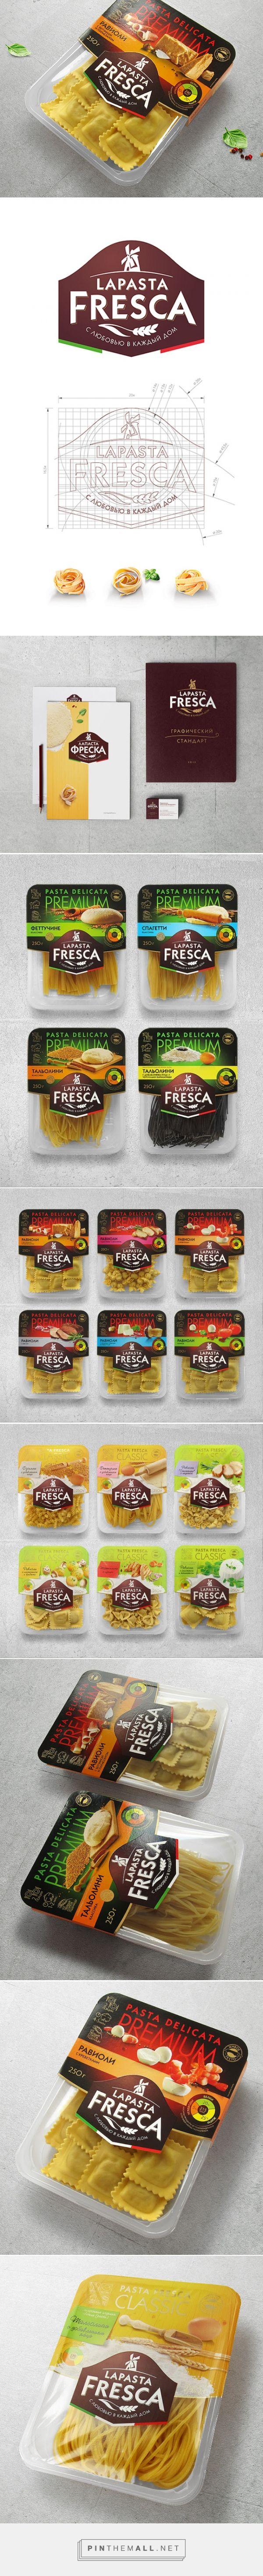 La Pasta Fresca packaging designed by Star Design Studio - http://www.packagingoftheworld.com/2015/09/la-pasta-fresca.html